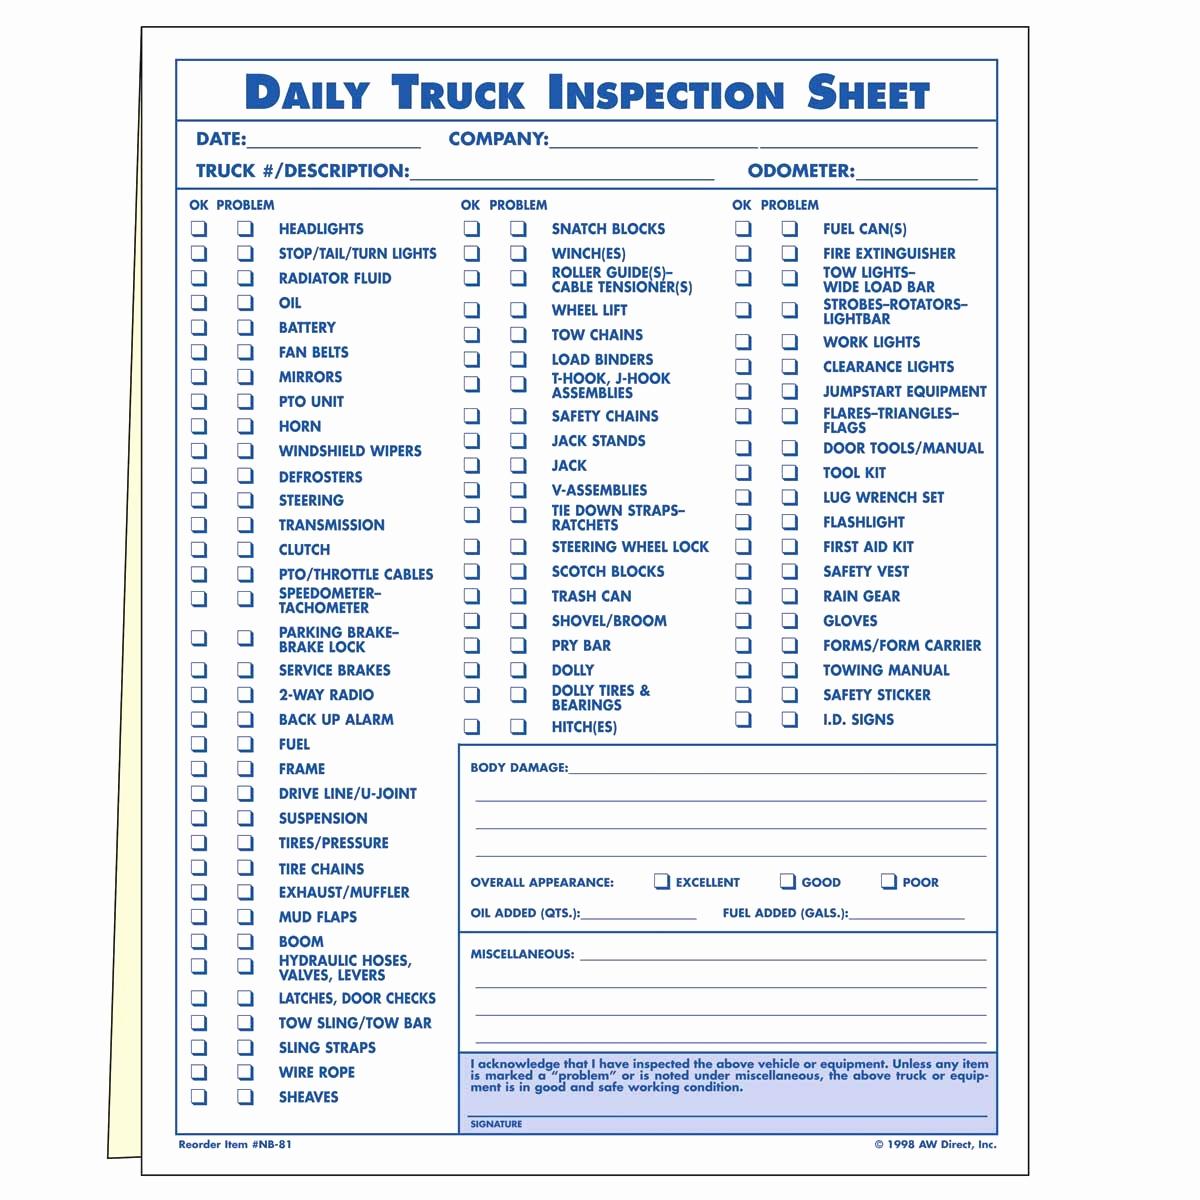 Pre Trip Vehicle Inspection Form Template Impressive Dot Pre Trip Inspection Checklist Fresh Daily Checklist Template